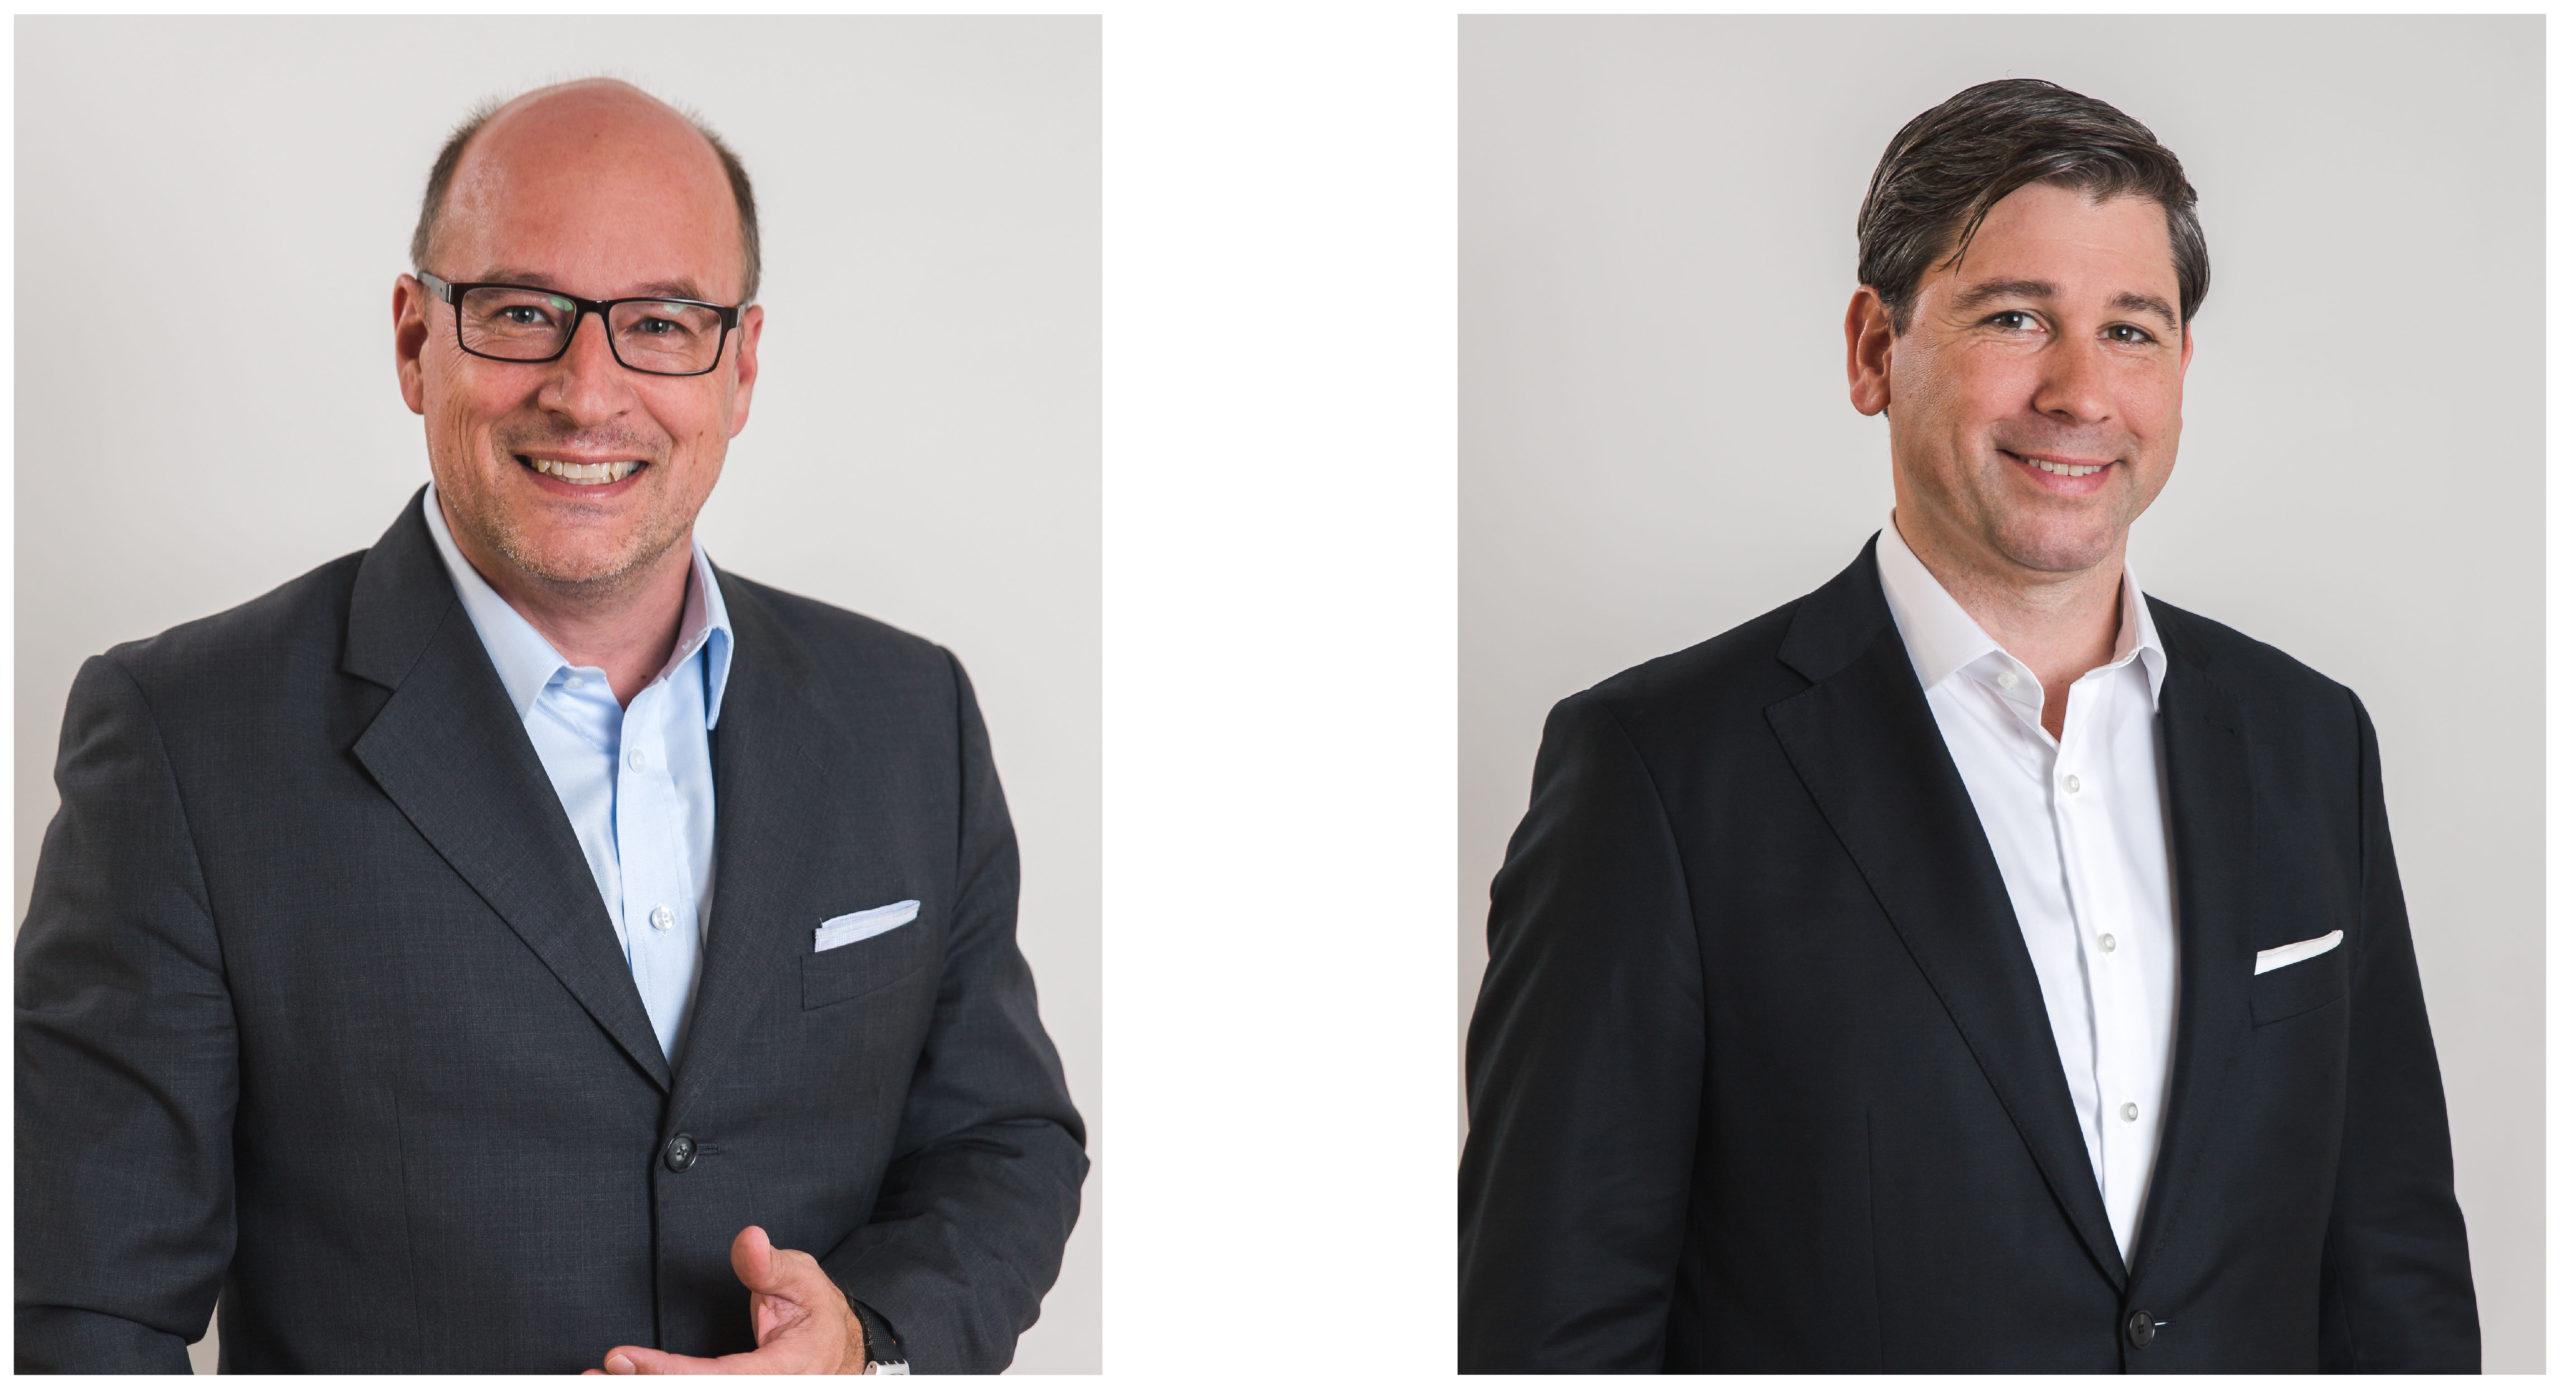 Daniel Knuchel und Matthias Ortner, Equity Partner der Advicum Consulting GmbH